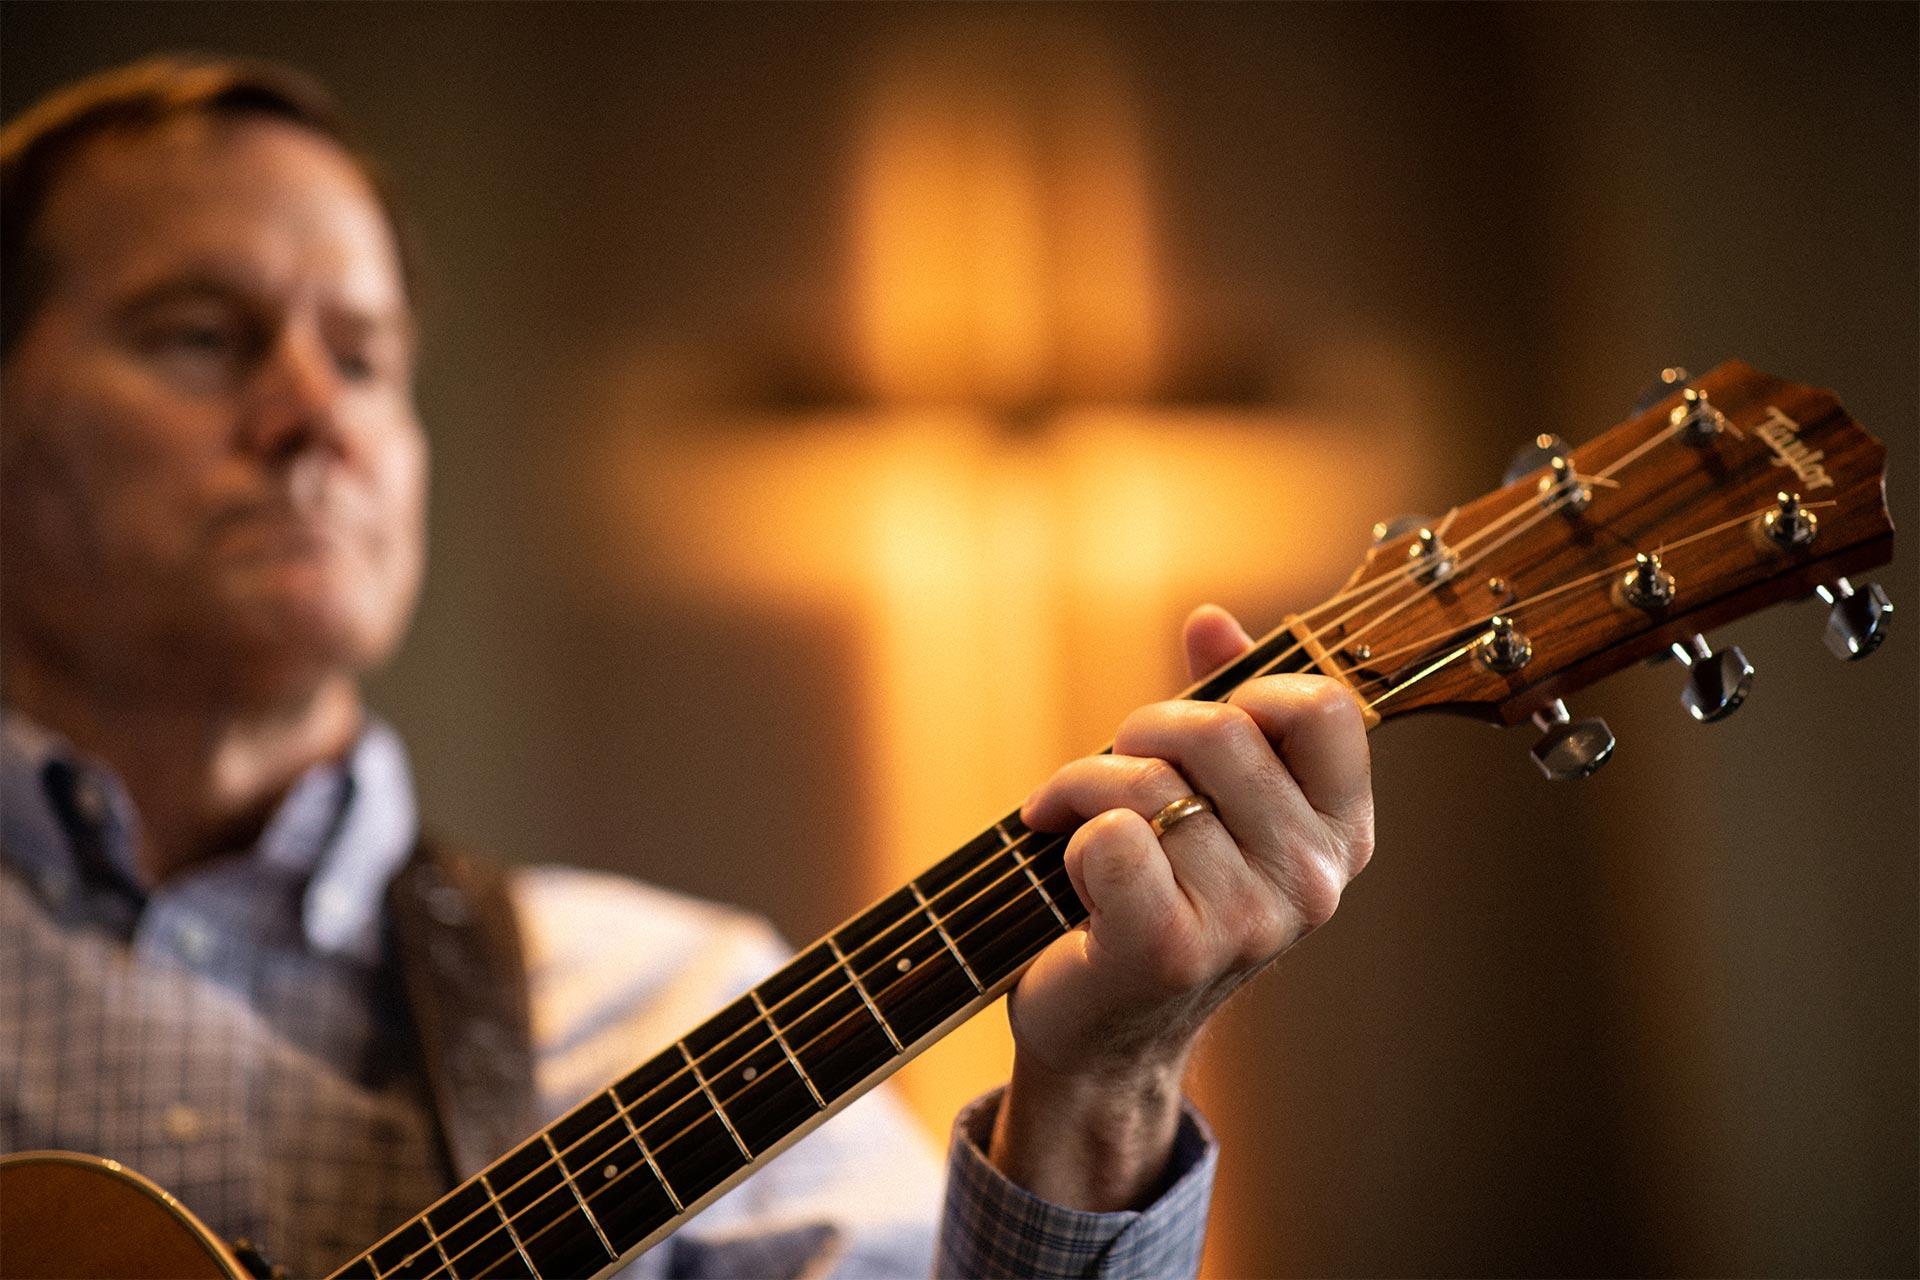 Bill Crawford playing guitar